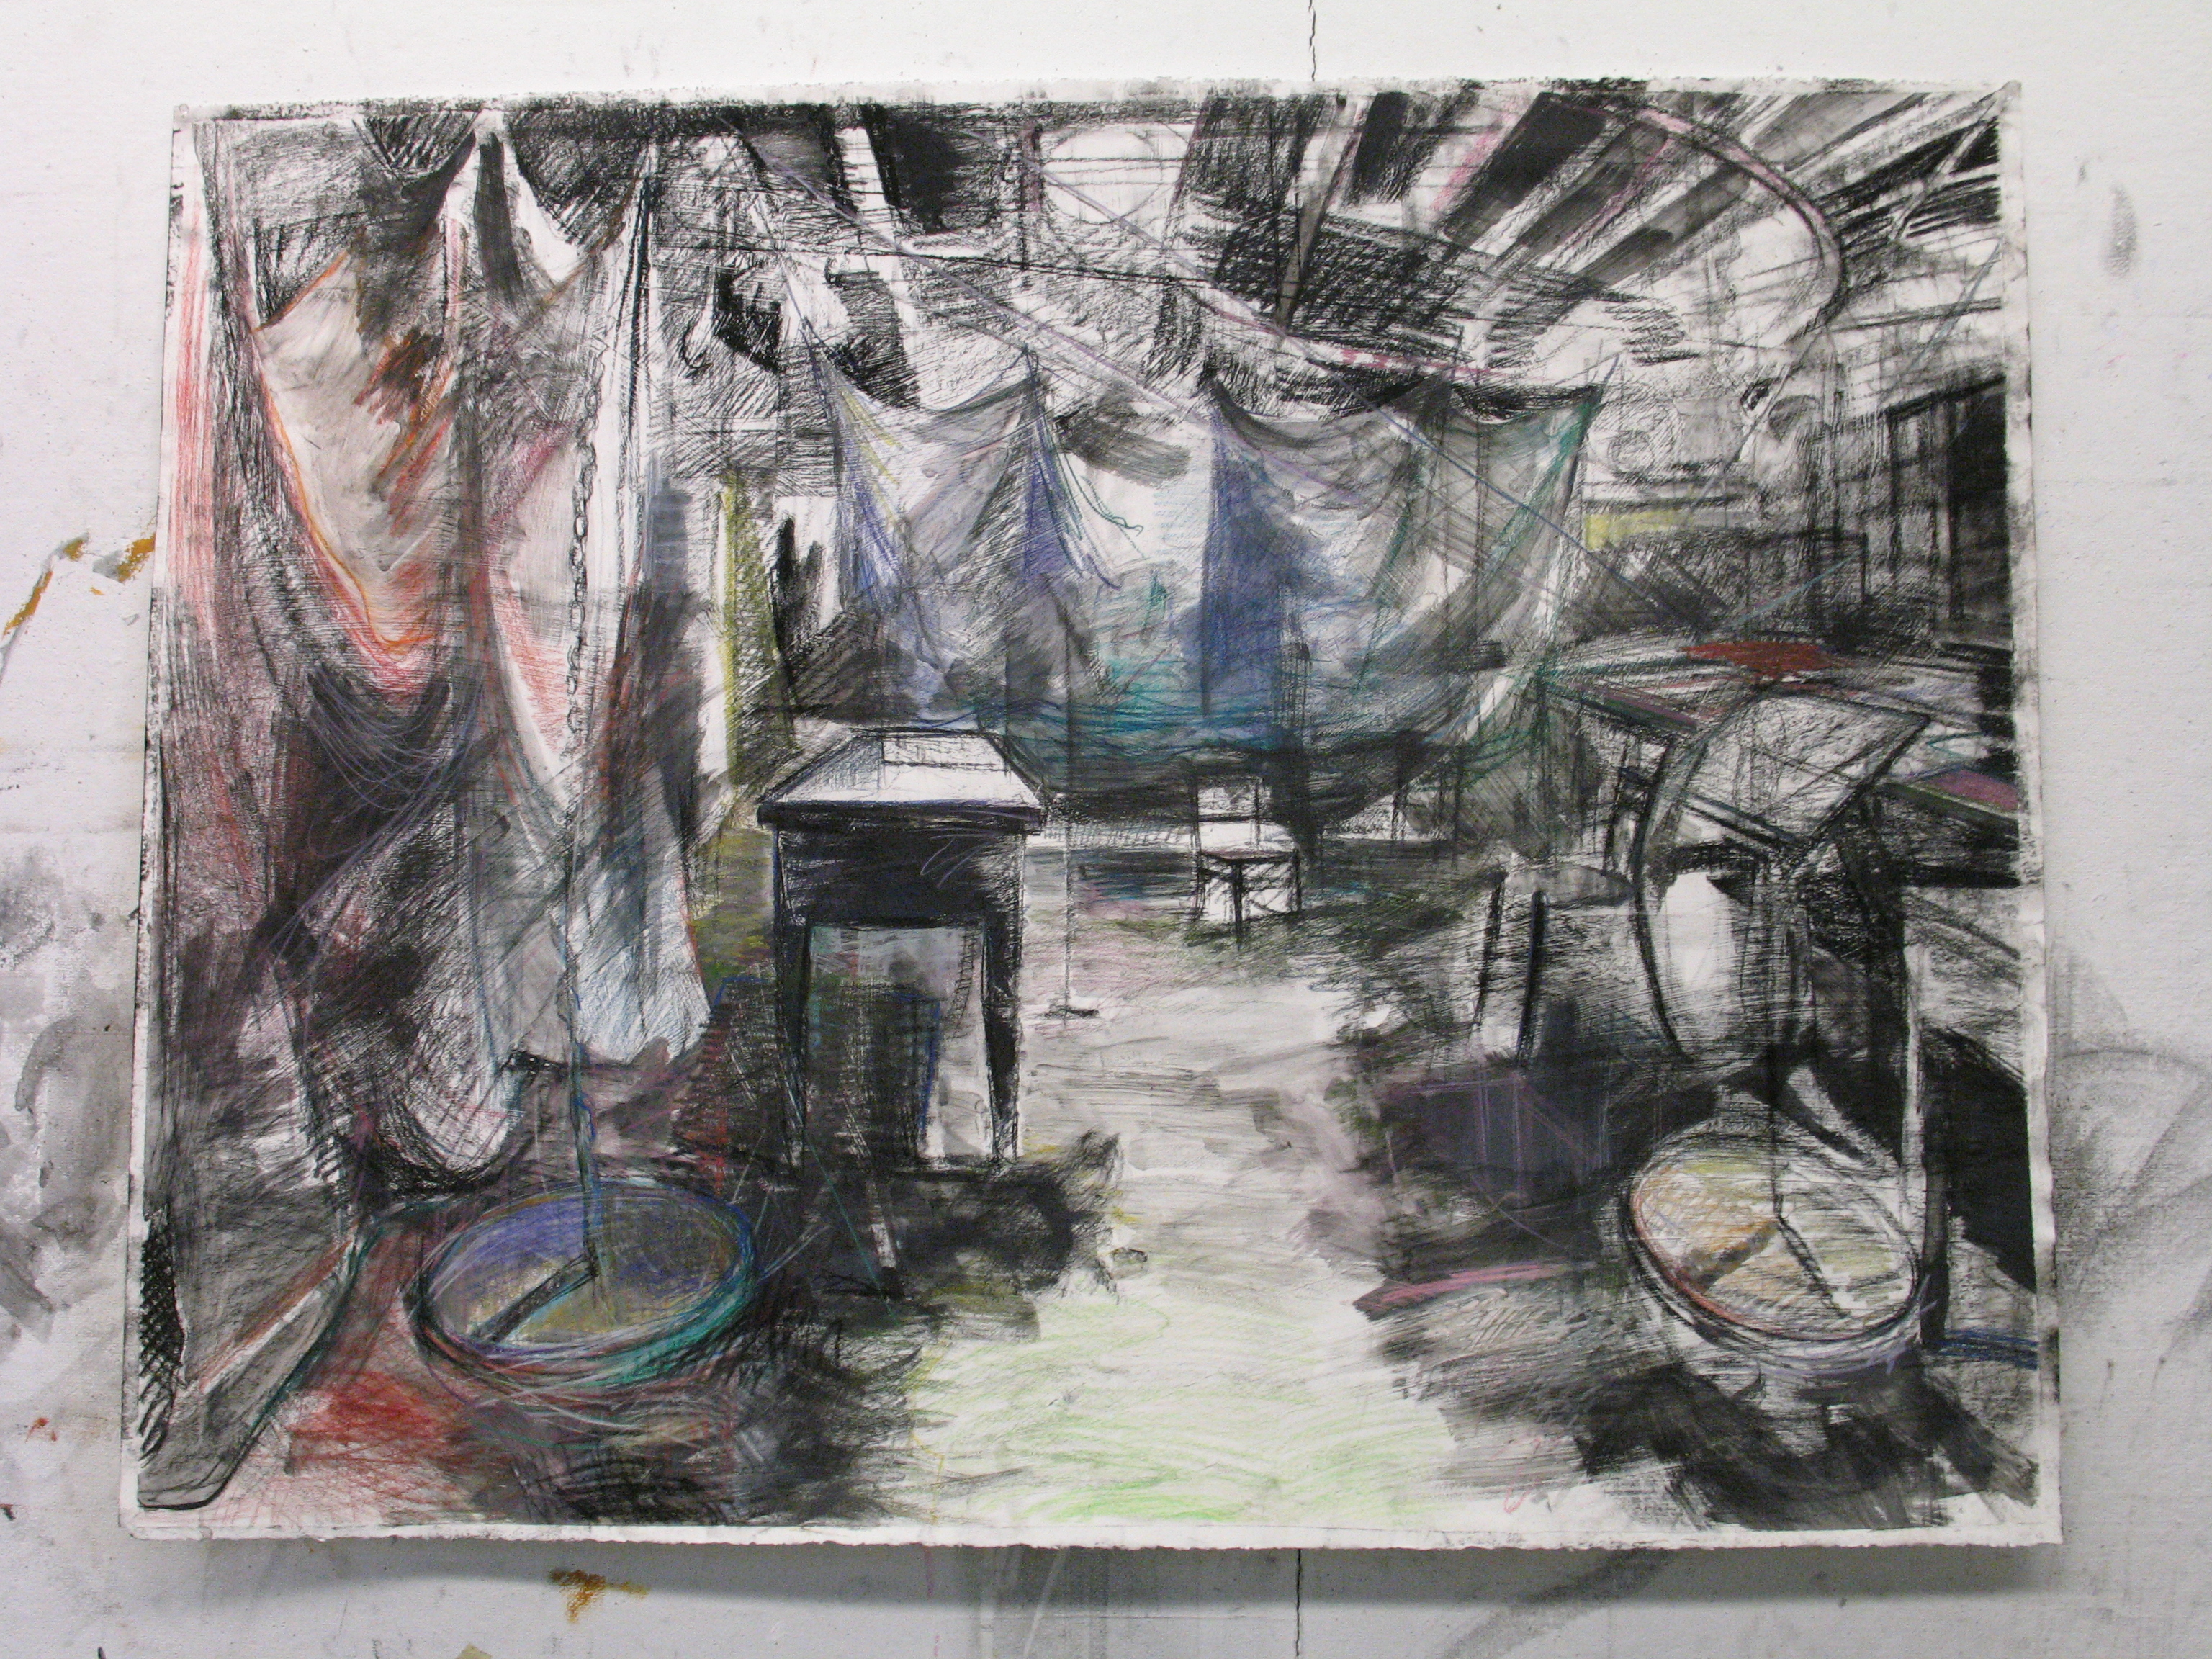 Inside Ann Hamilton's Studio, 2012